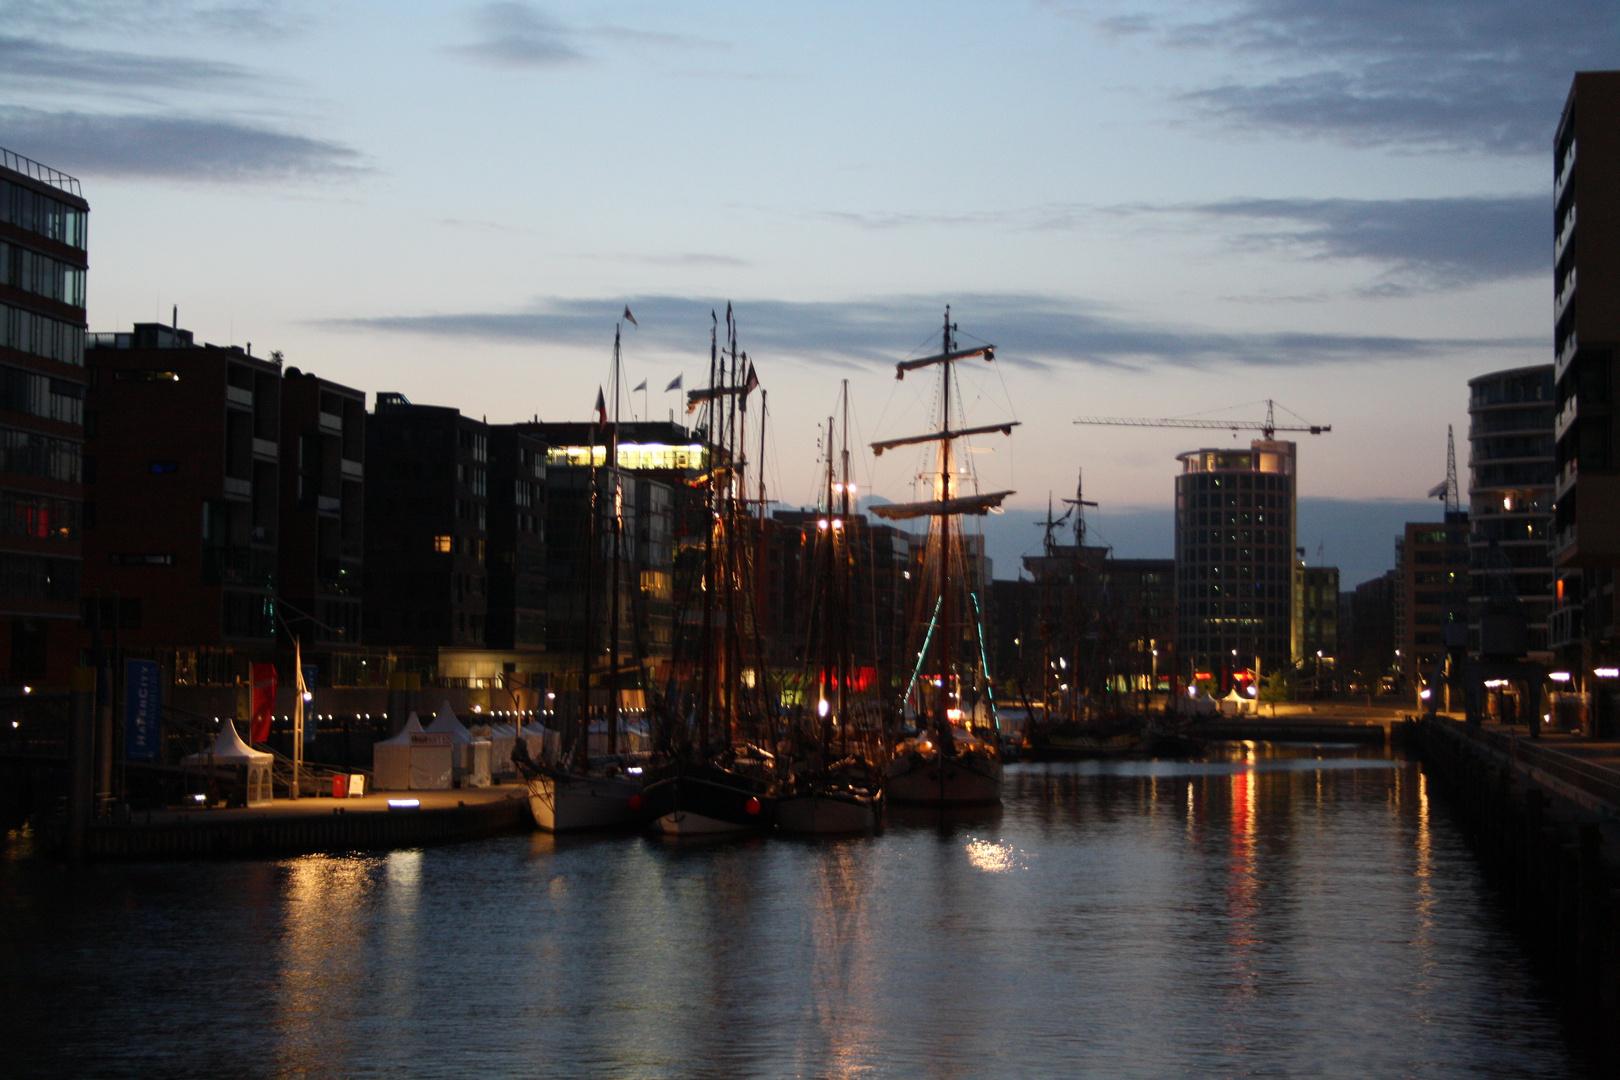 Morgens um halb 5 in Hamburg